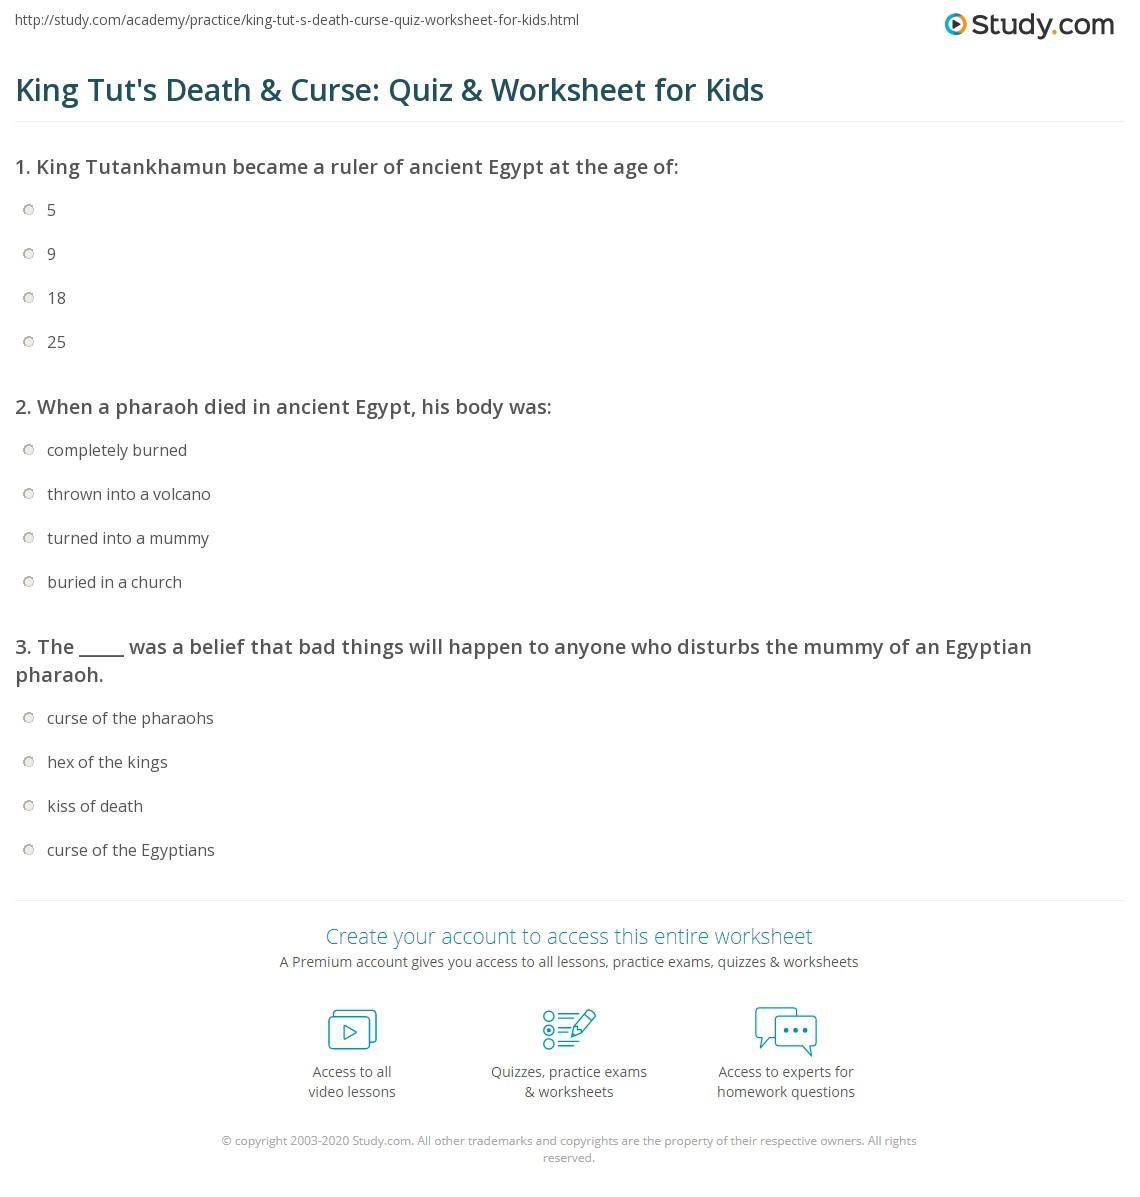 King Tut's Death & Curse: Quiz & Worksheet for Kids | Study.com